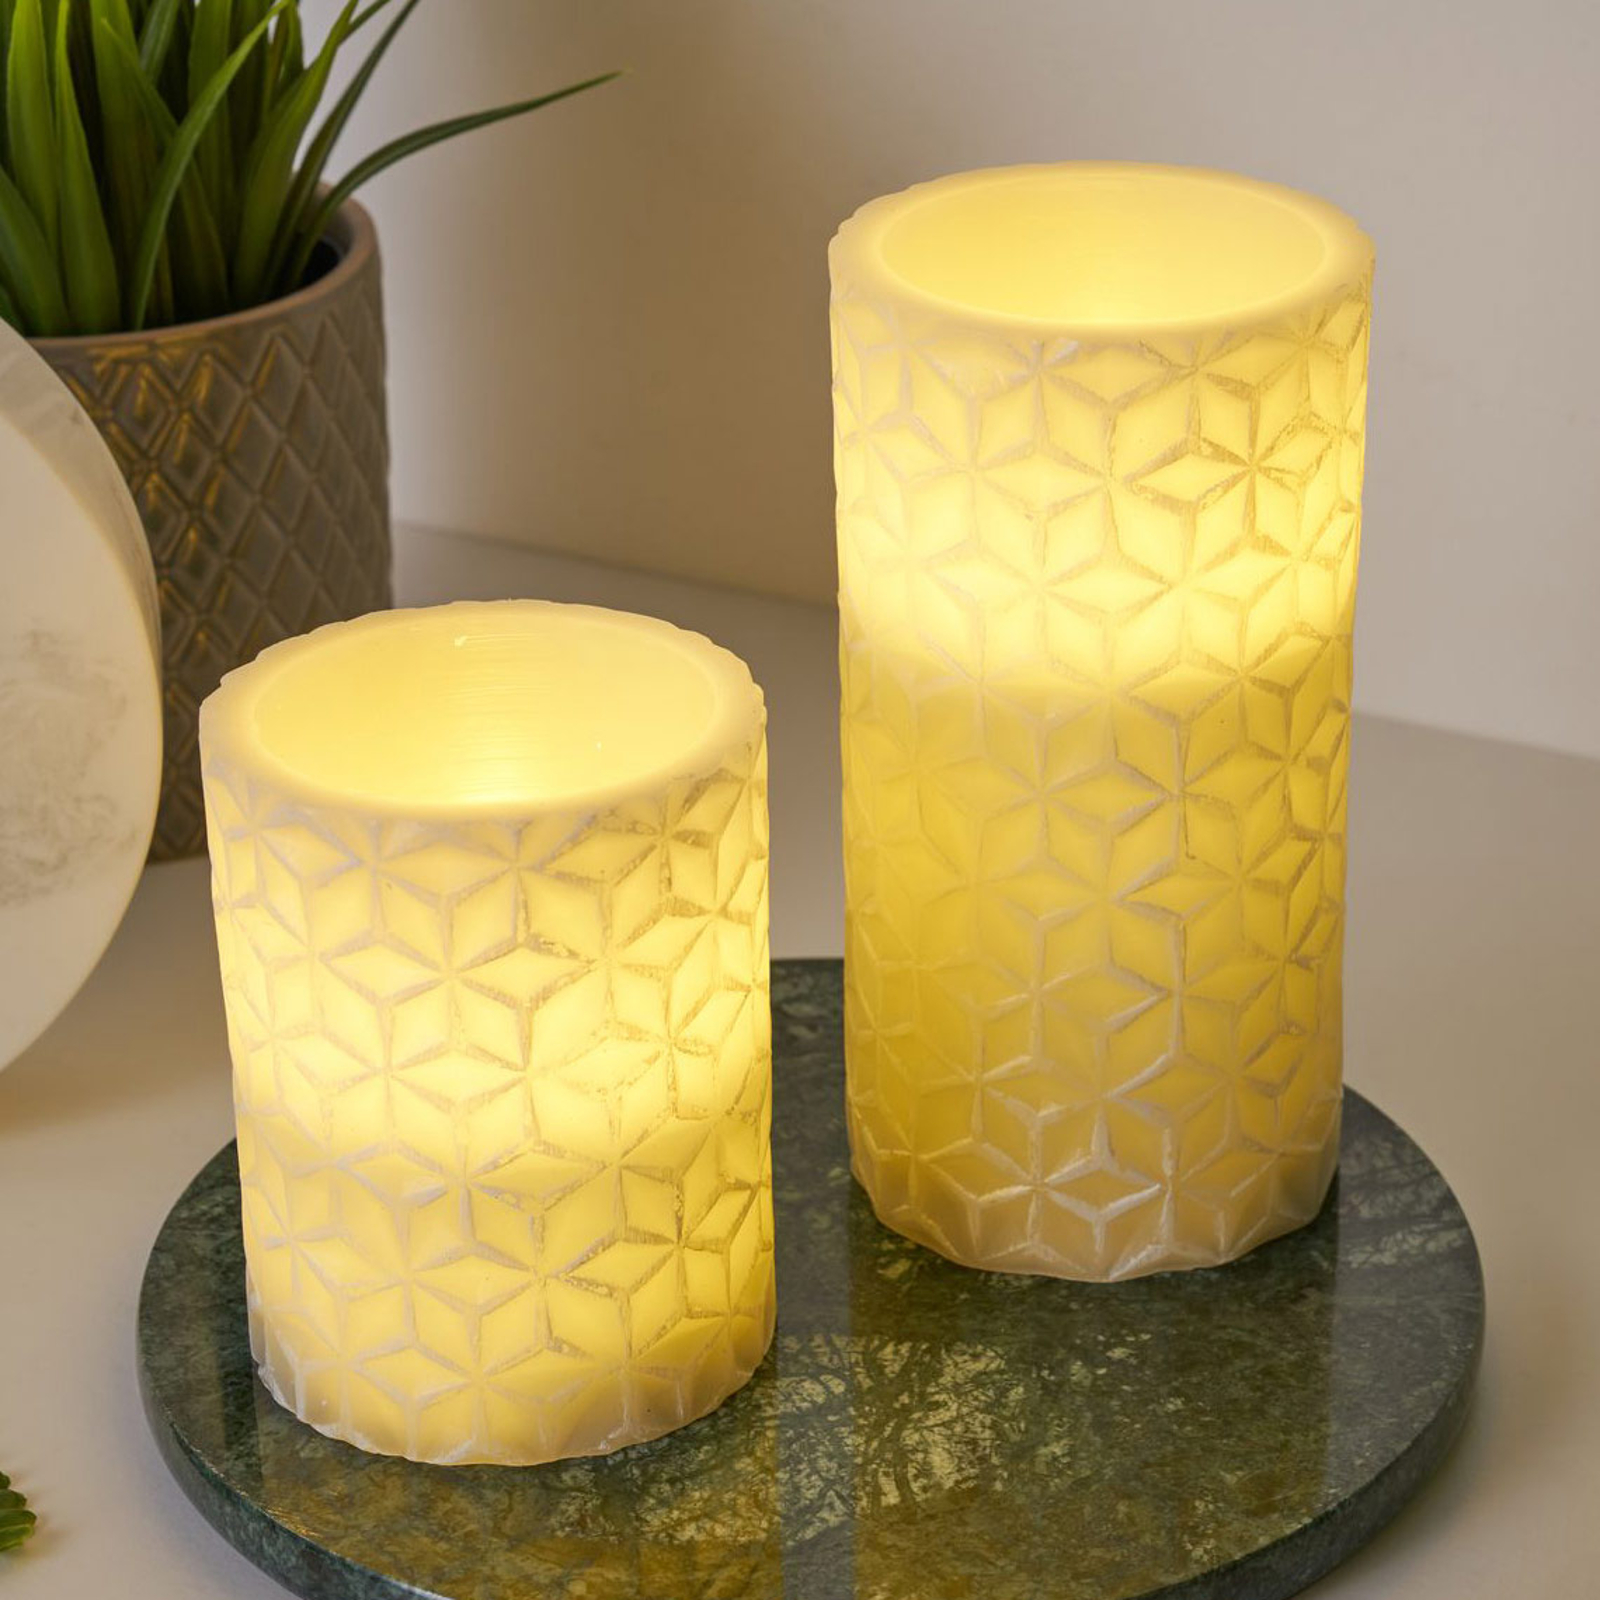 Pauleen Cosy Ornament Candle LED-mignon 2er-sett